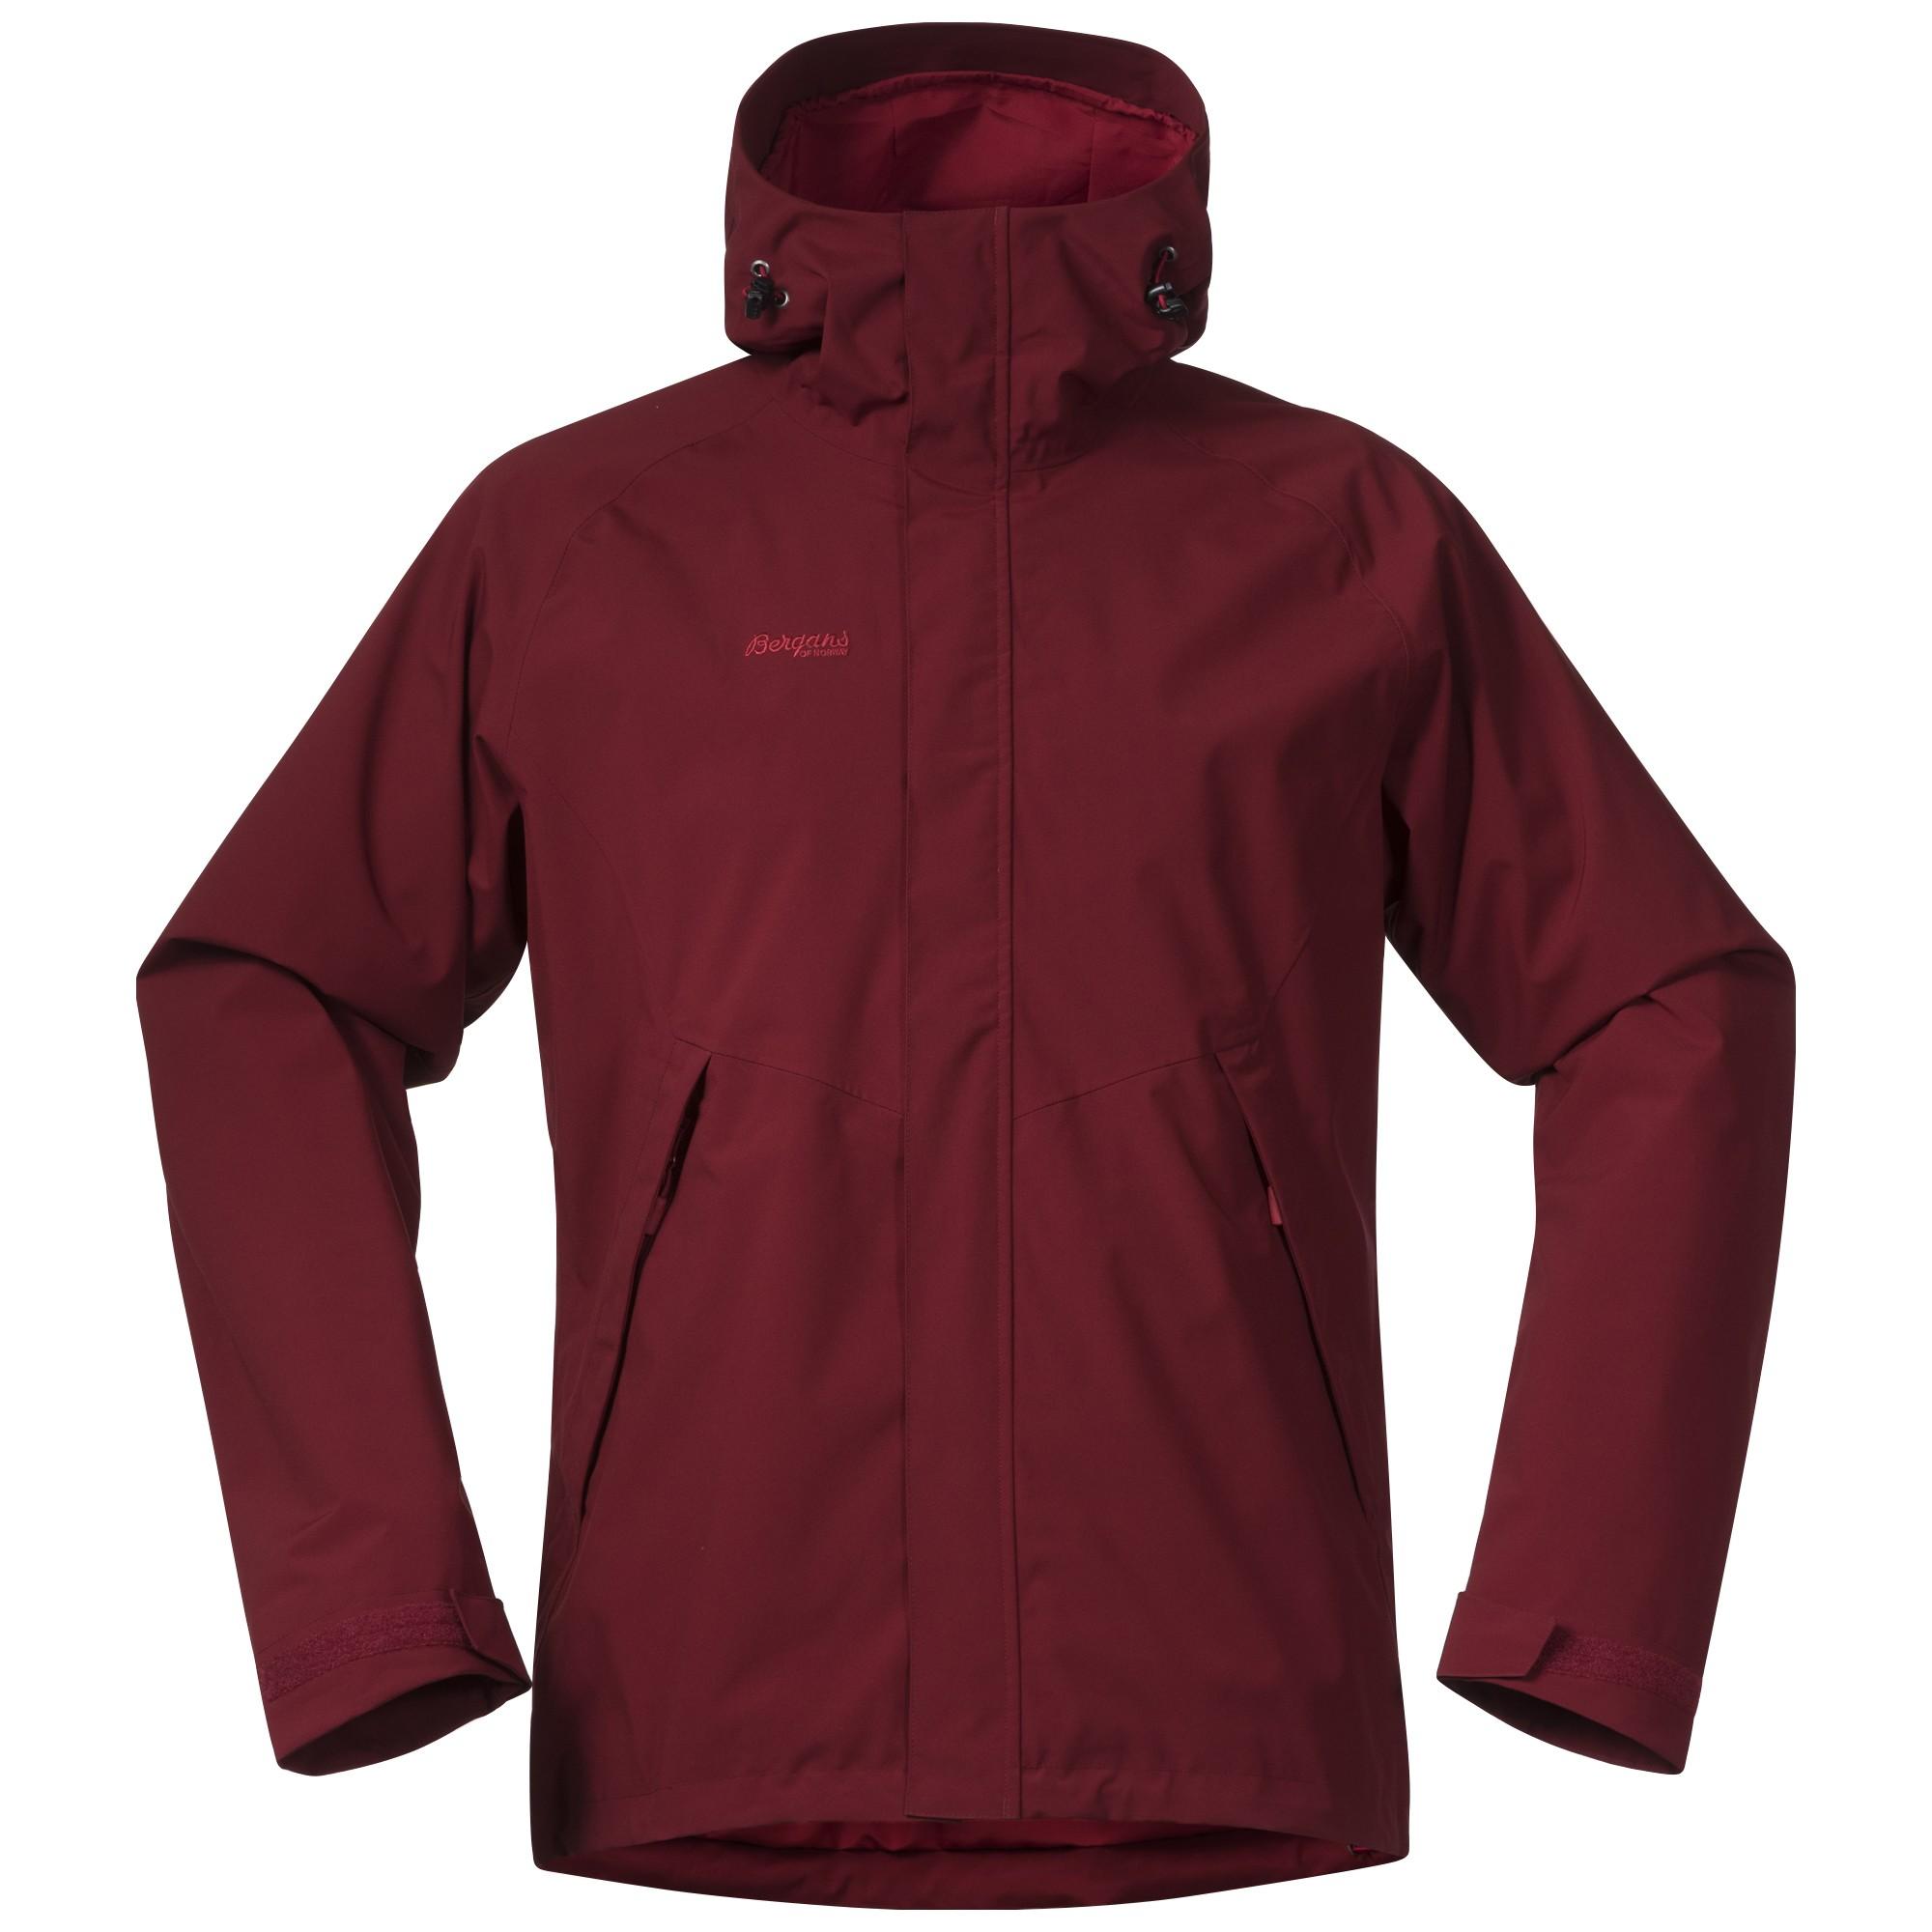 8e8f342d9099ee Bergans Ramberg Jacket